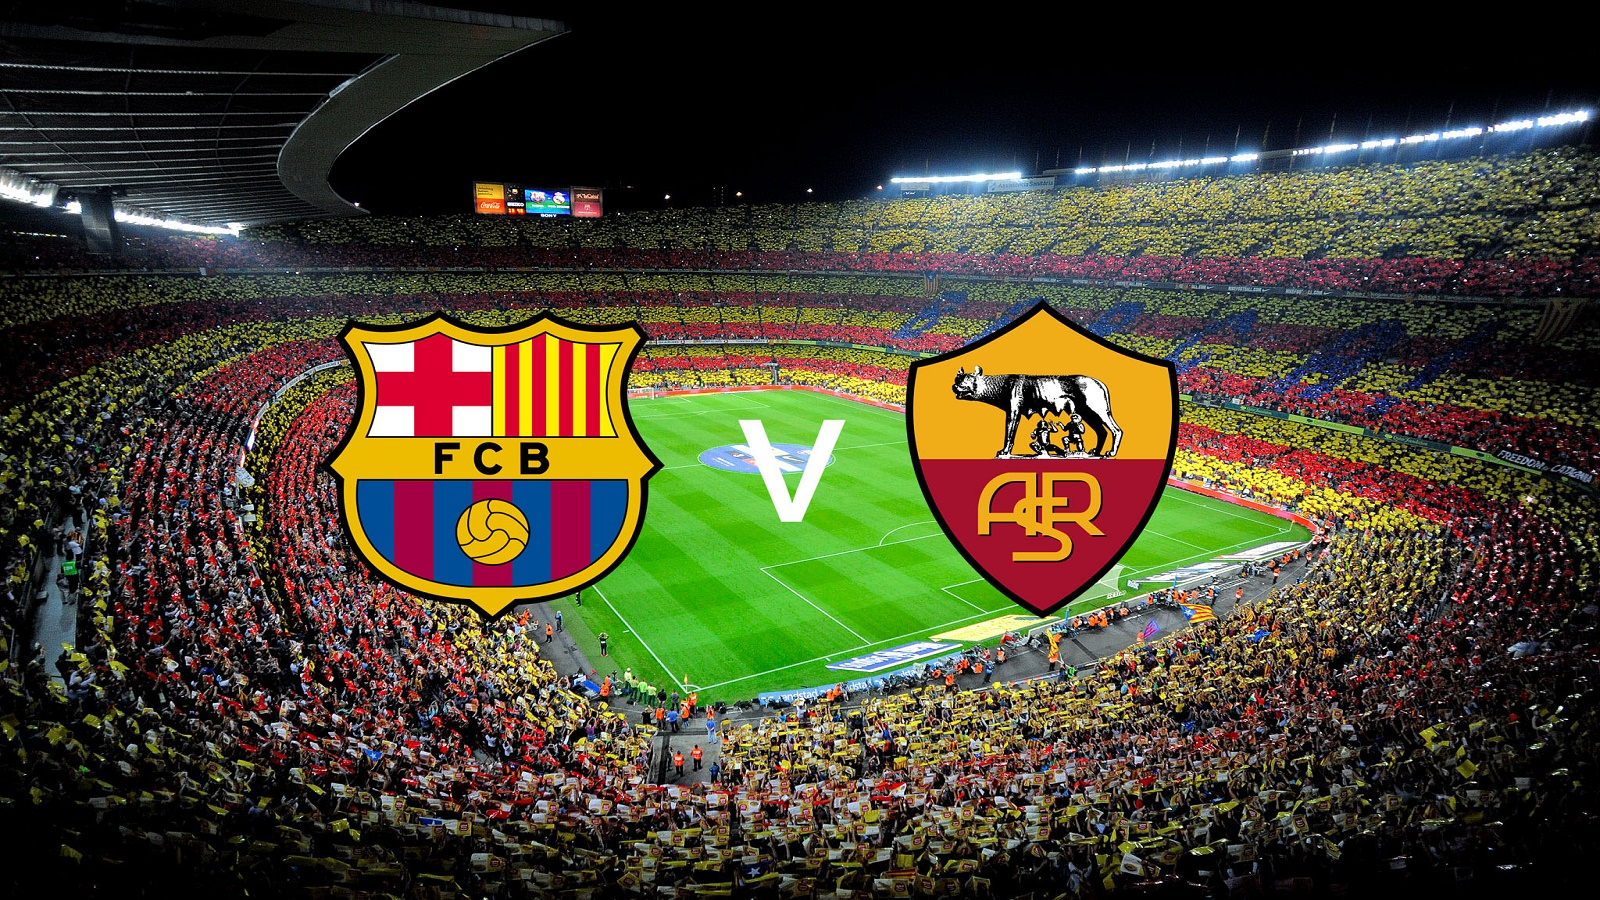 Ningún milagro en el Camp Nou, el Barça venció al Roma 4-1